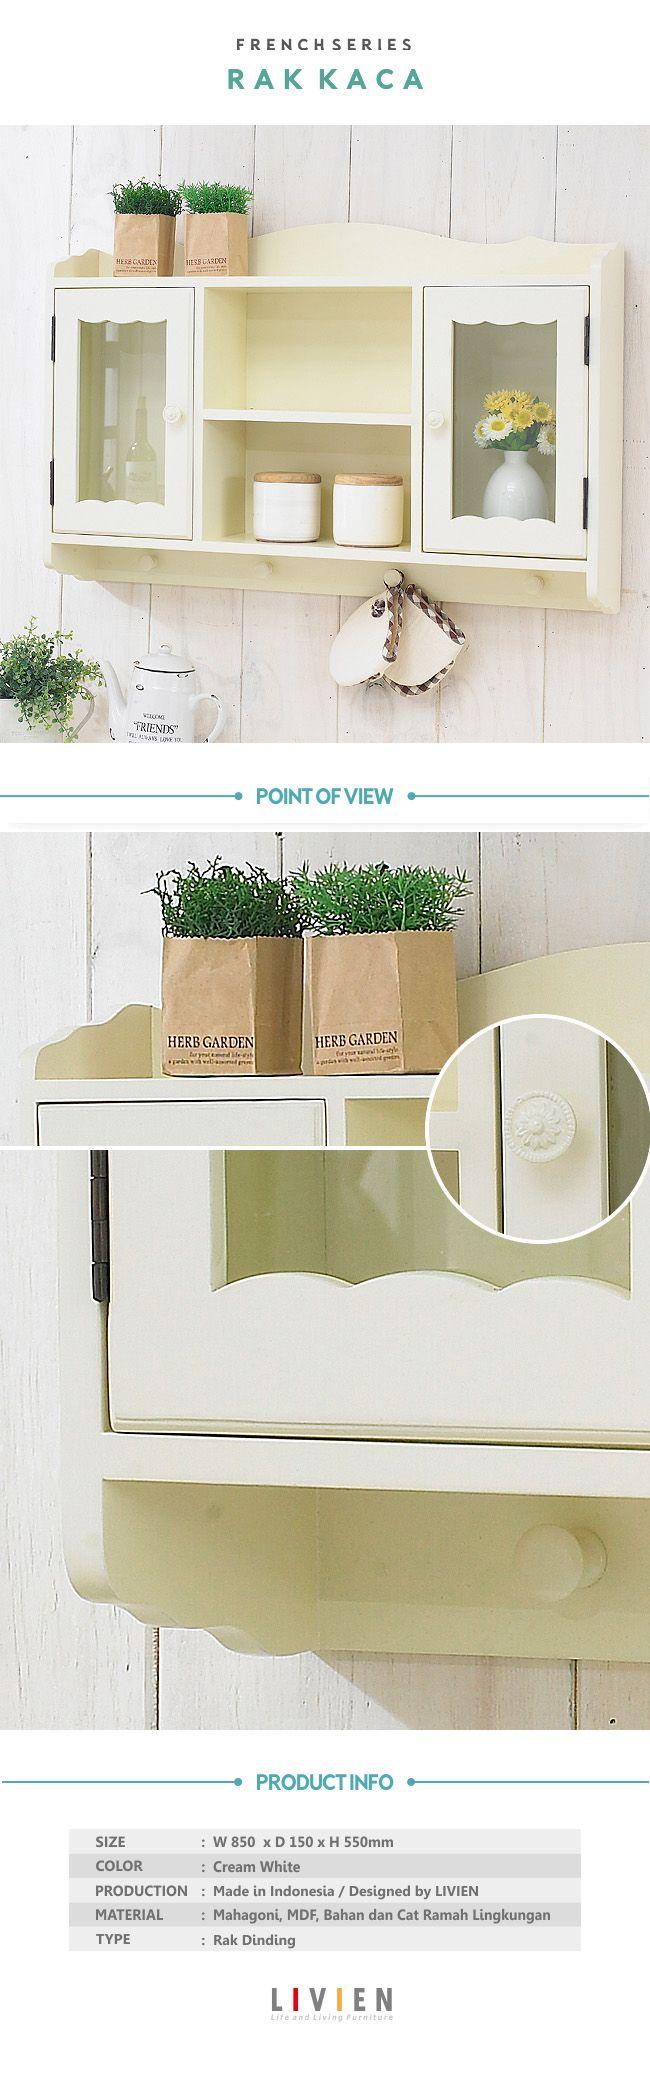 Rak Kaca French Series  #homedecor #kitchenroom #homeideas #interiorideas #furniture